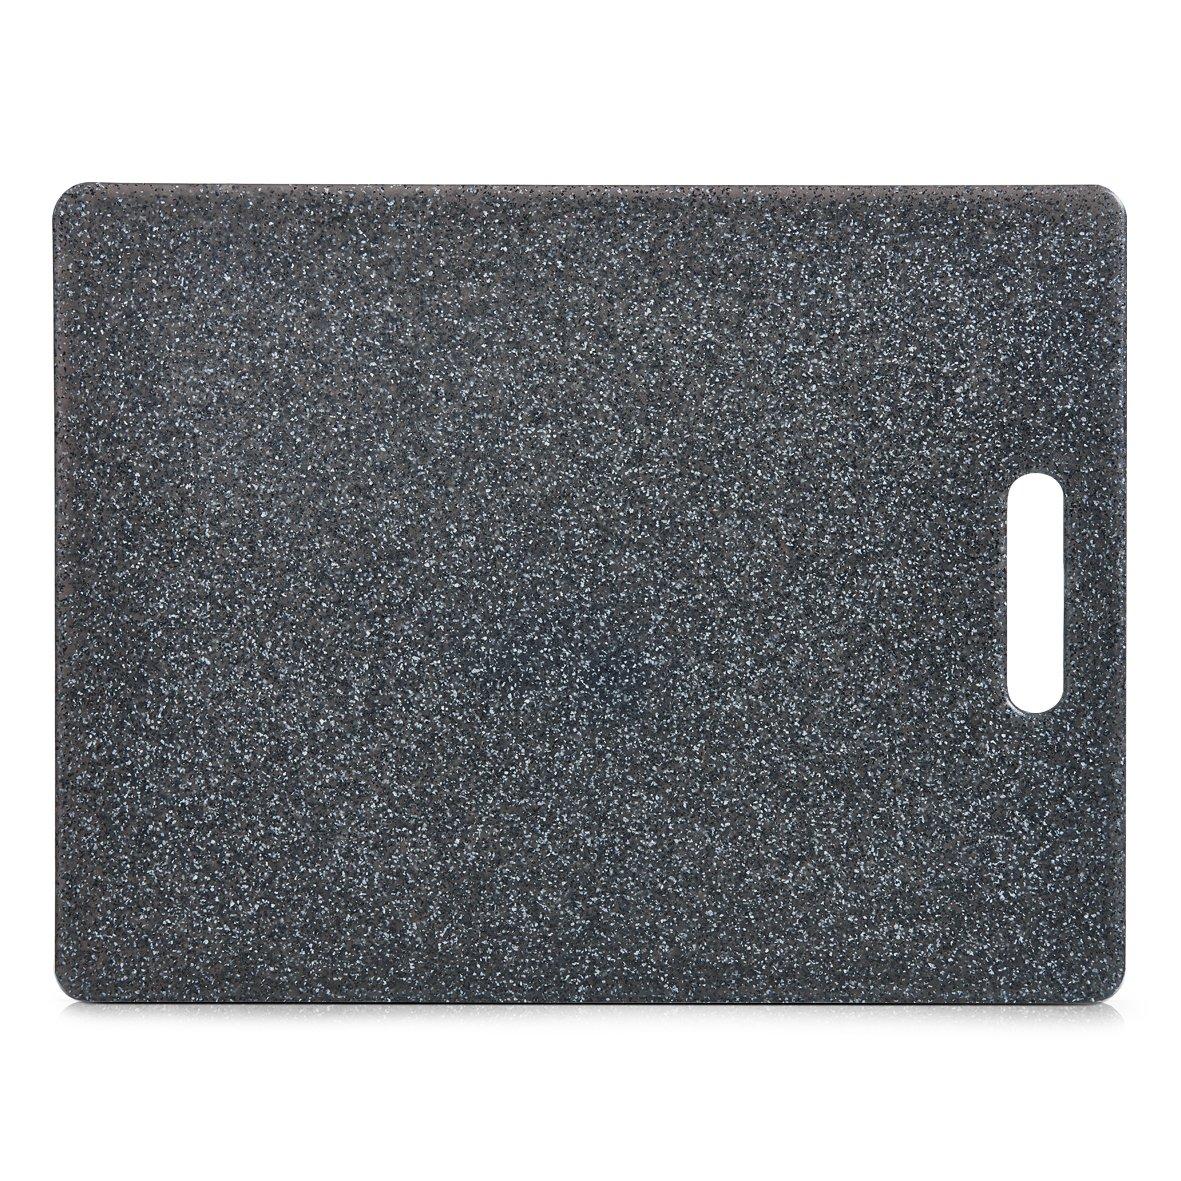 Zeller 26057 Tabla para Cortar, Gris, 36.5x27.5x3 cm